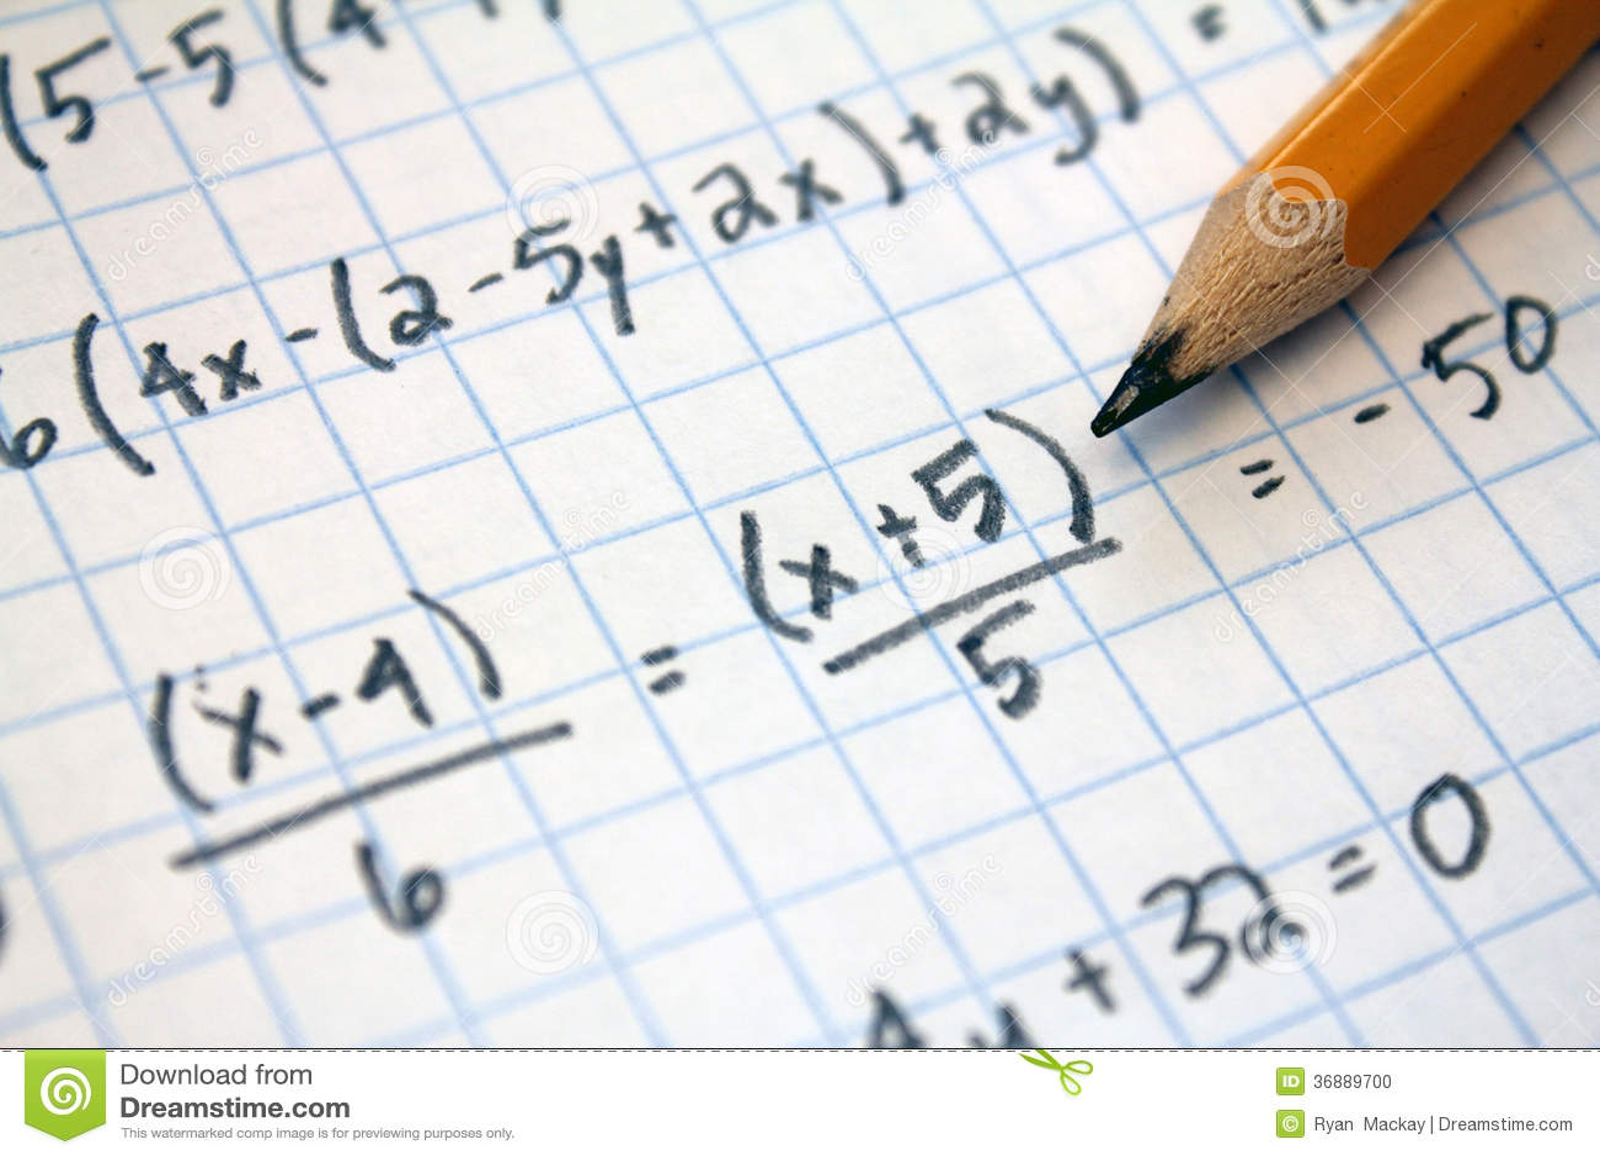 Math problems stock photo. Image of equation, algebra - 36889700